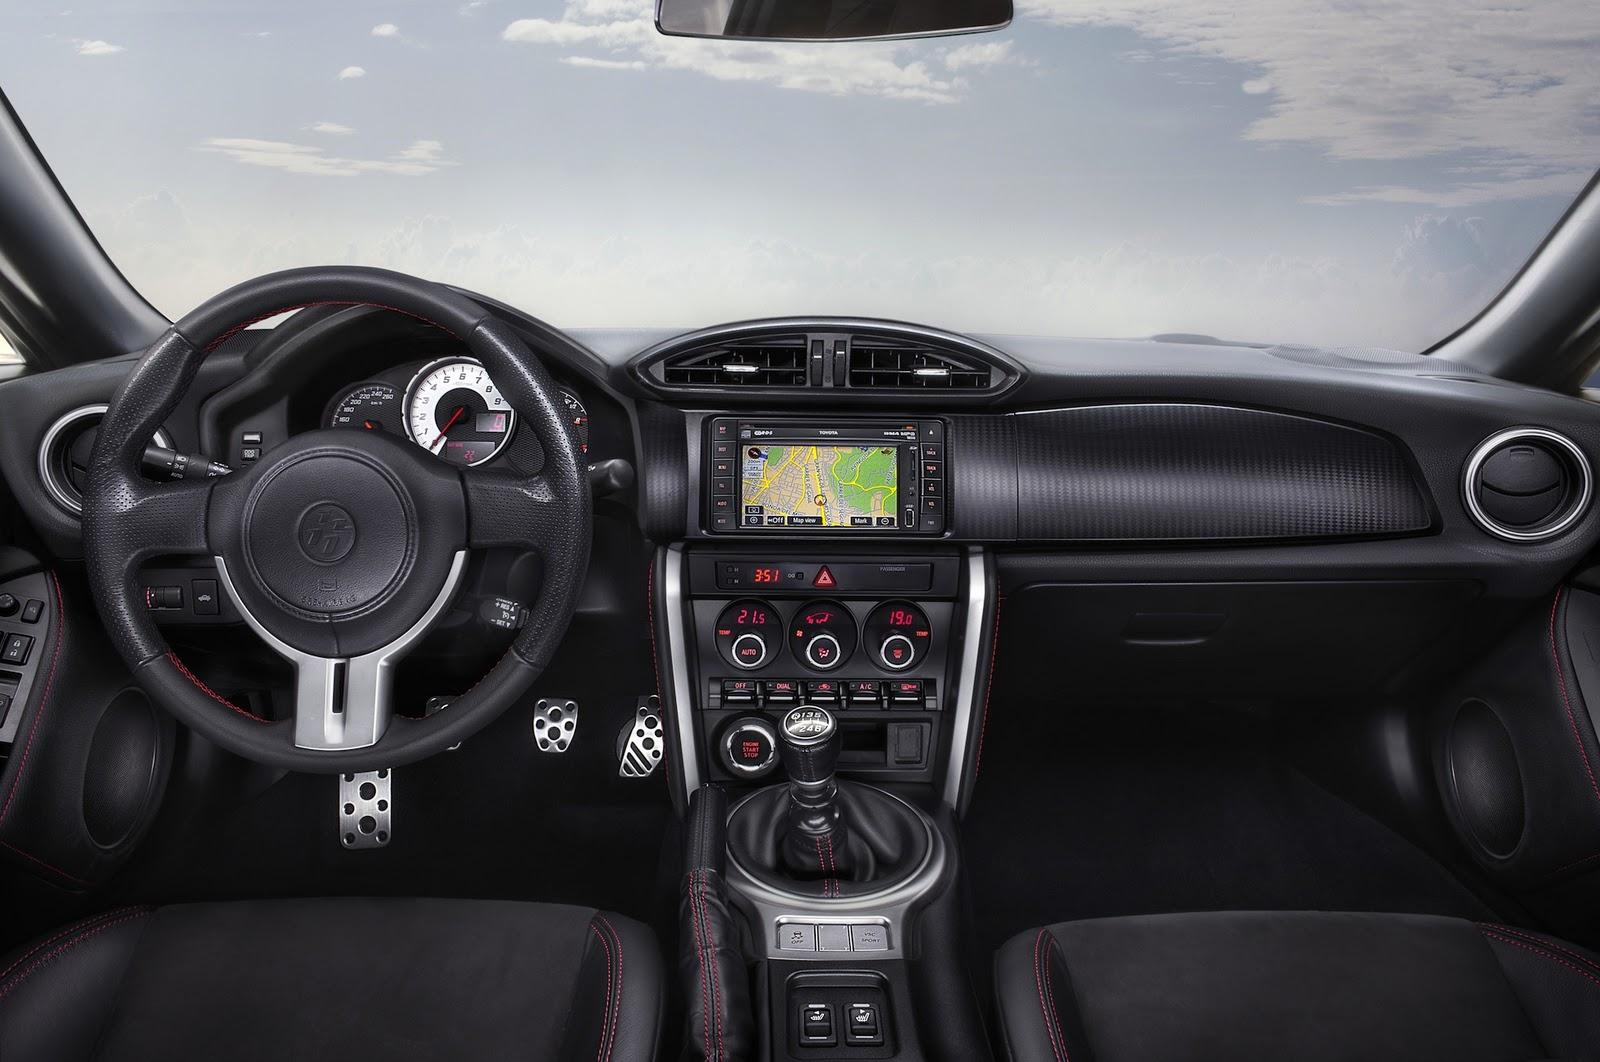 Toyota GT86 Subaru BRZ lang lebe der Driftkönig [Archiv] BMW